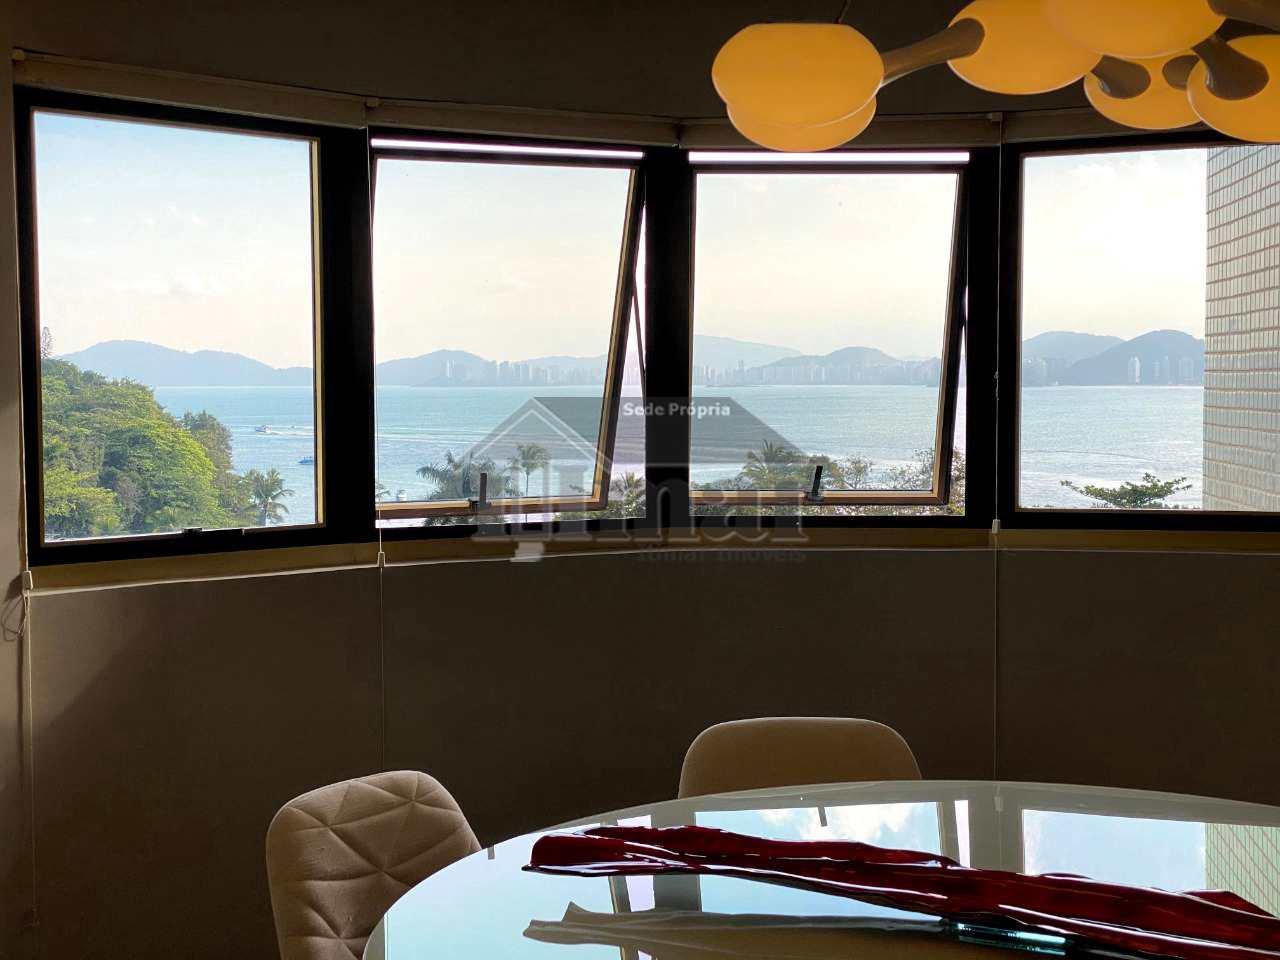 FRENTE TOTAL MAR, 4 suites, TORTUGAS,  - R$ 1.8 mi, Cod: 5437